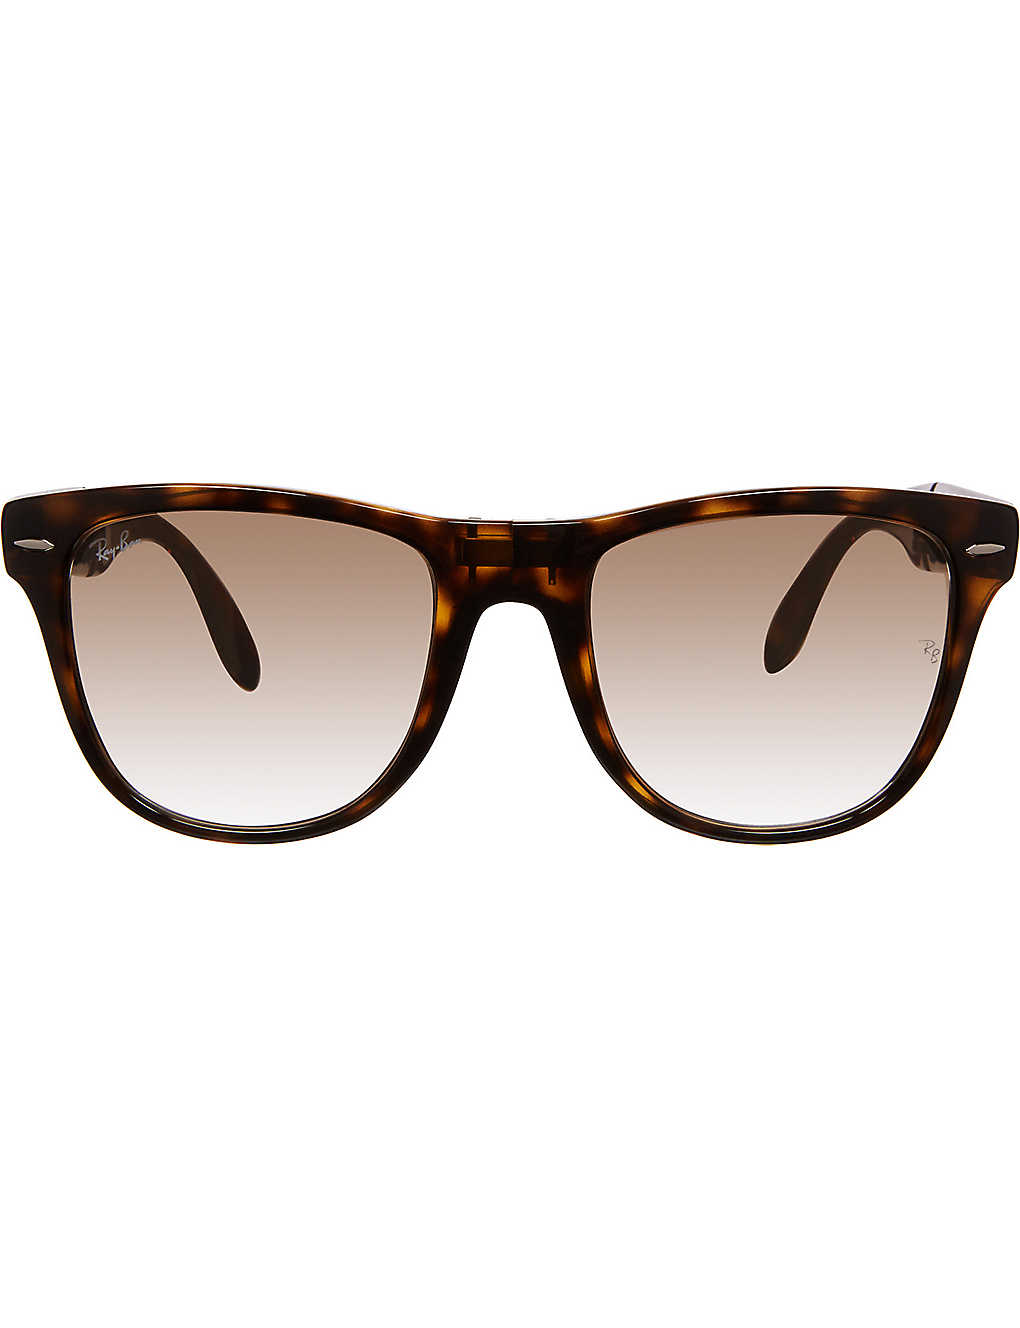 d7807a0c5aee6 Wayfarer Folding Classic square sunglasses RB4105 50 - Light havana ...